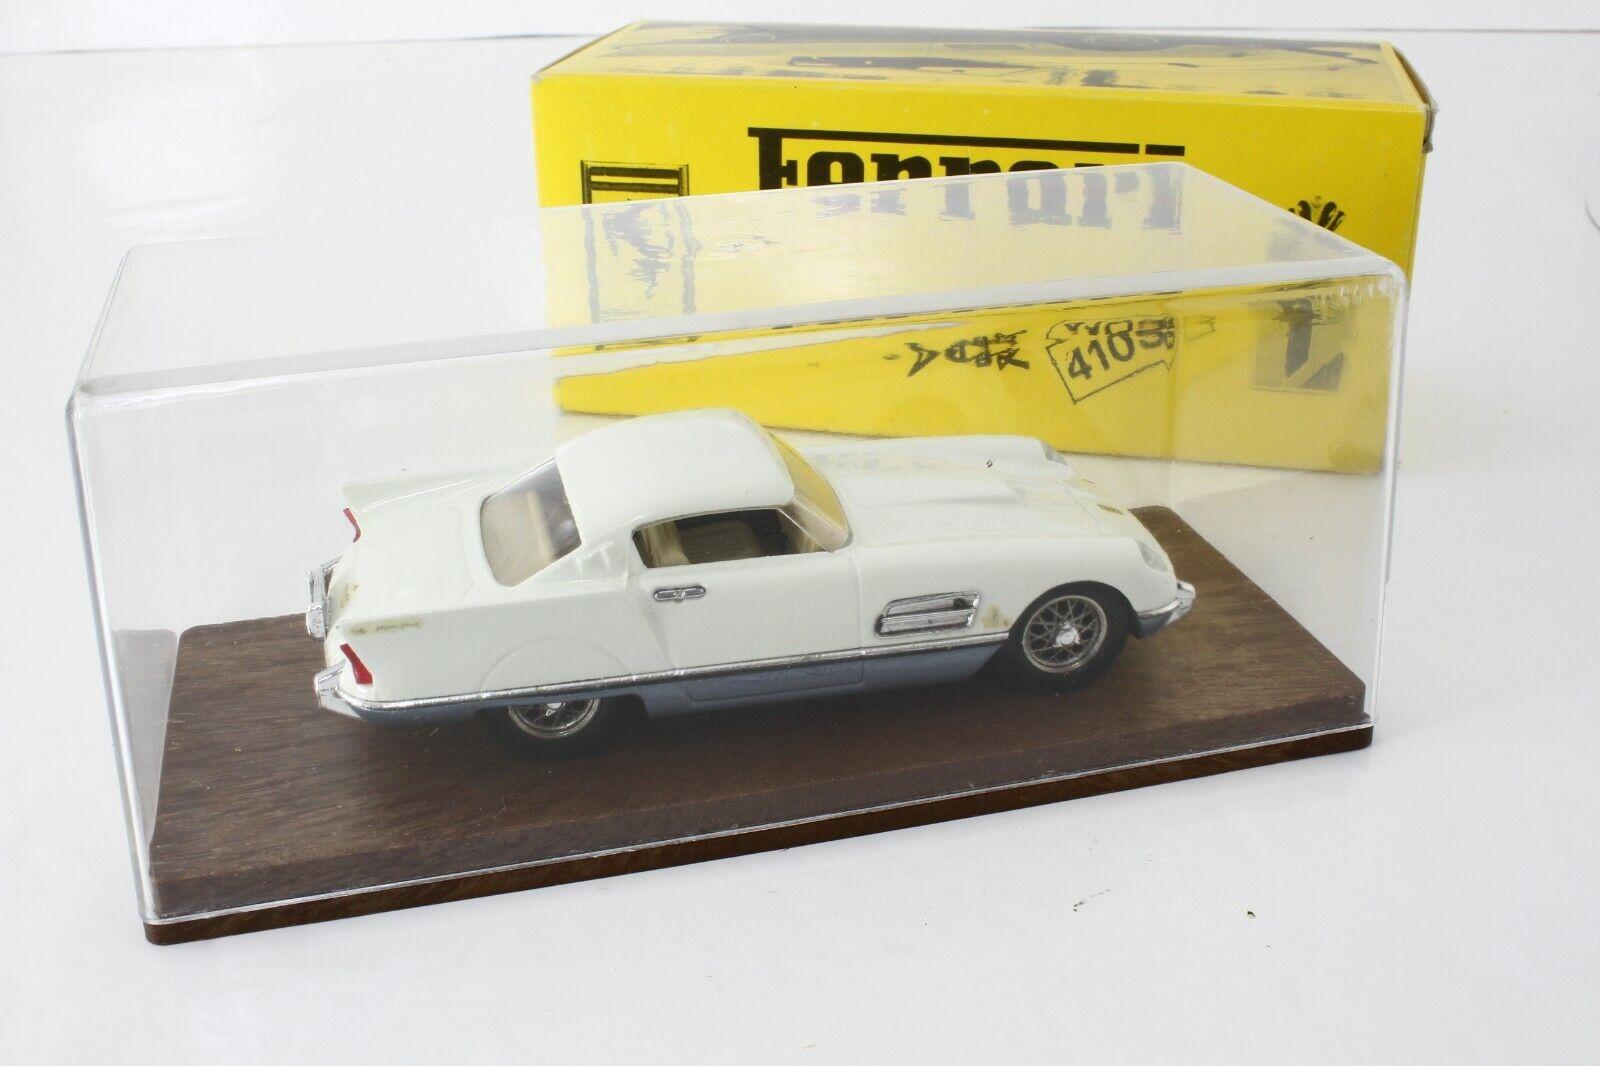 IDEA 3  101 Ferrari 410 S.A. Superfast Super America Coupe 1956 NIB 1 43 Mint